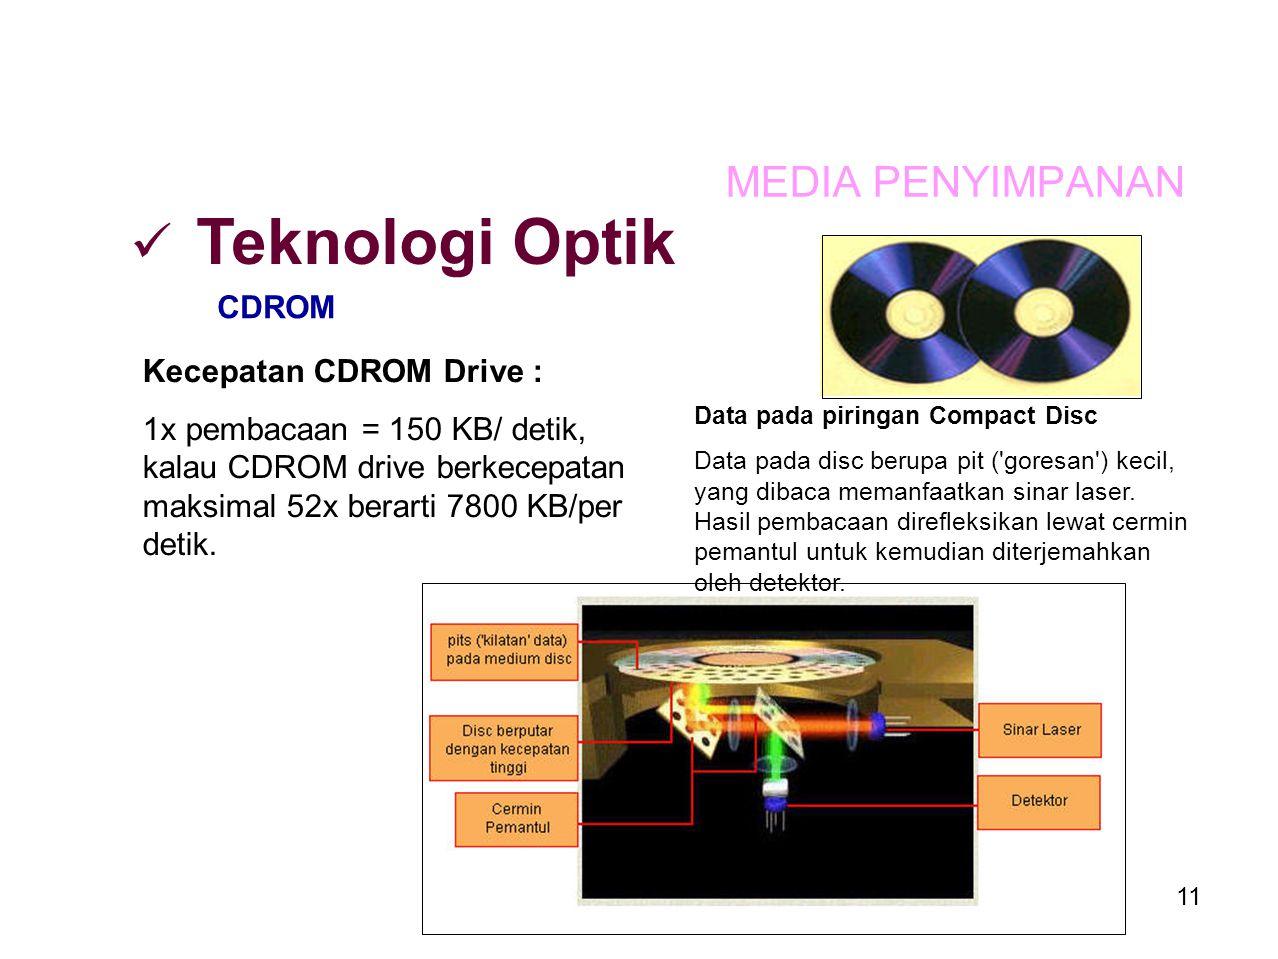 10 Teknologi Magnetik MEDIA PENYIMPANAN Hard Disk Tipe : IDE, SCSI Kapasitas : 320, 540, 850 MB 1.2, 4.3, 6.4 GB 10, 20, 40, 80 GB 1 Megabyte = 1024 K